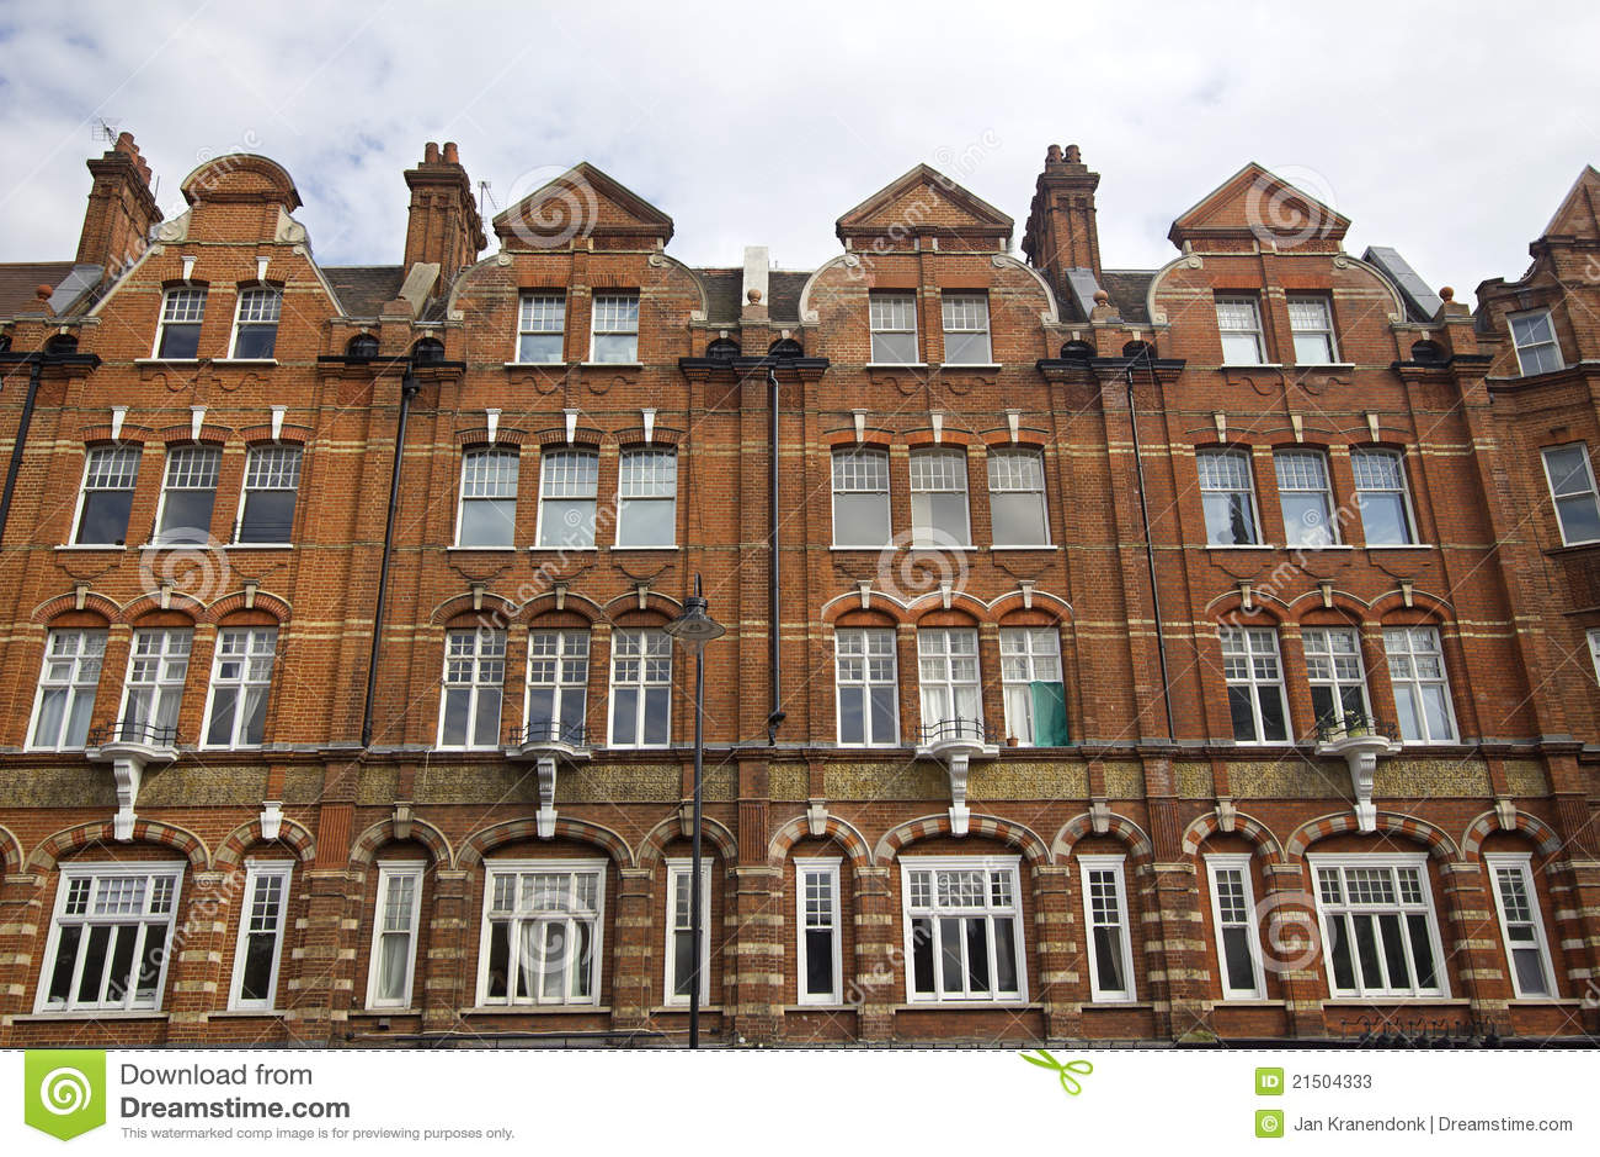 Kensington houses london stock photos image 21504333 for Knightsbridge homes